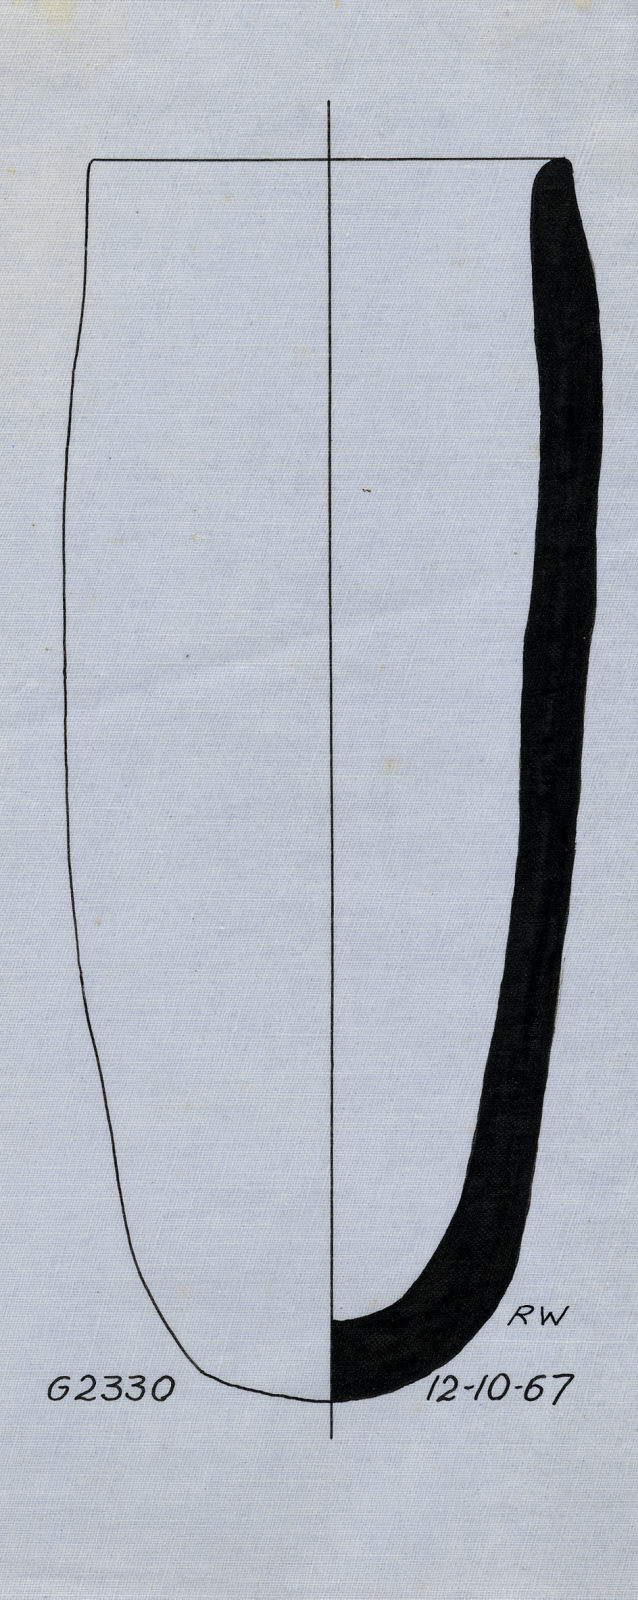 Drawings: G 2330 (= G 5380), Shaft A: pottery, jar